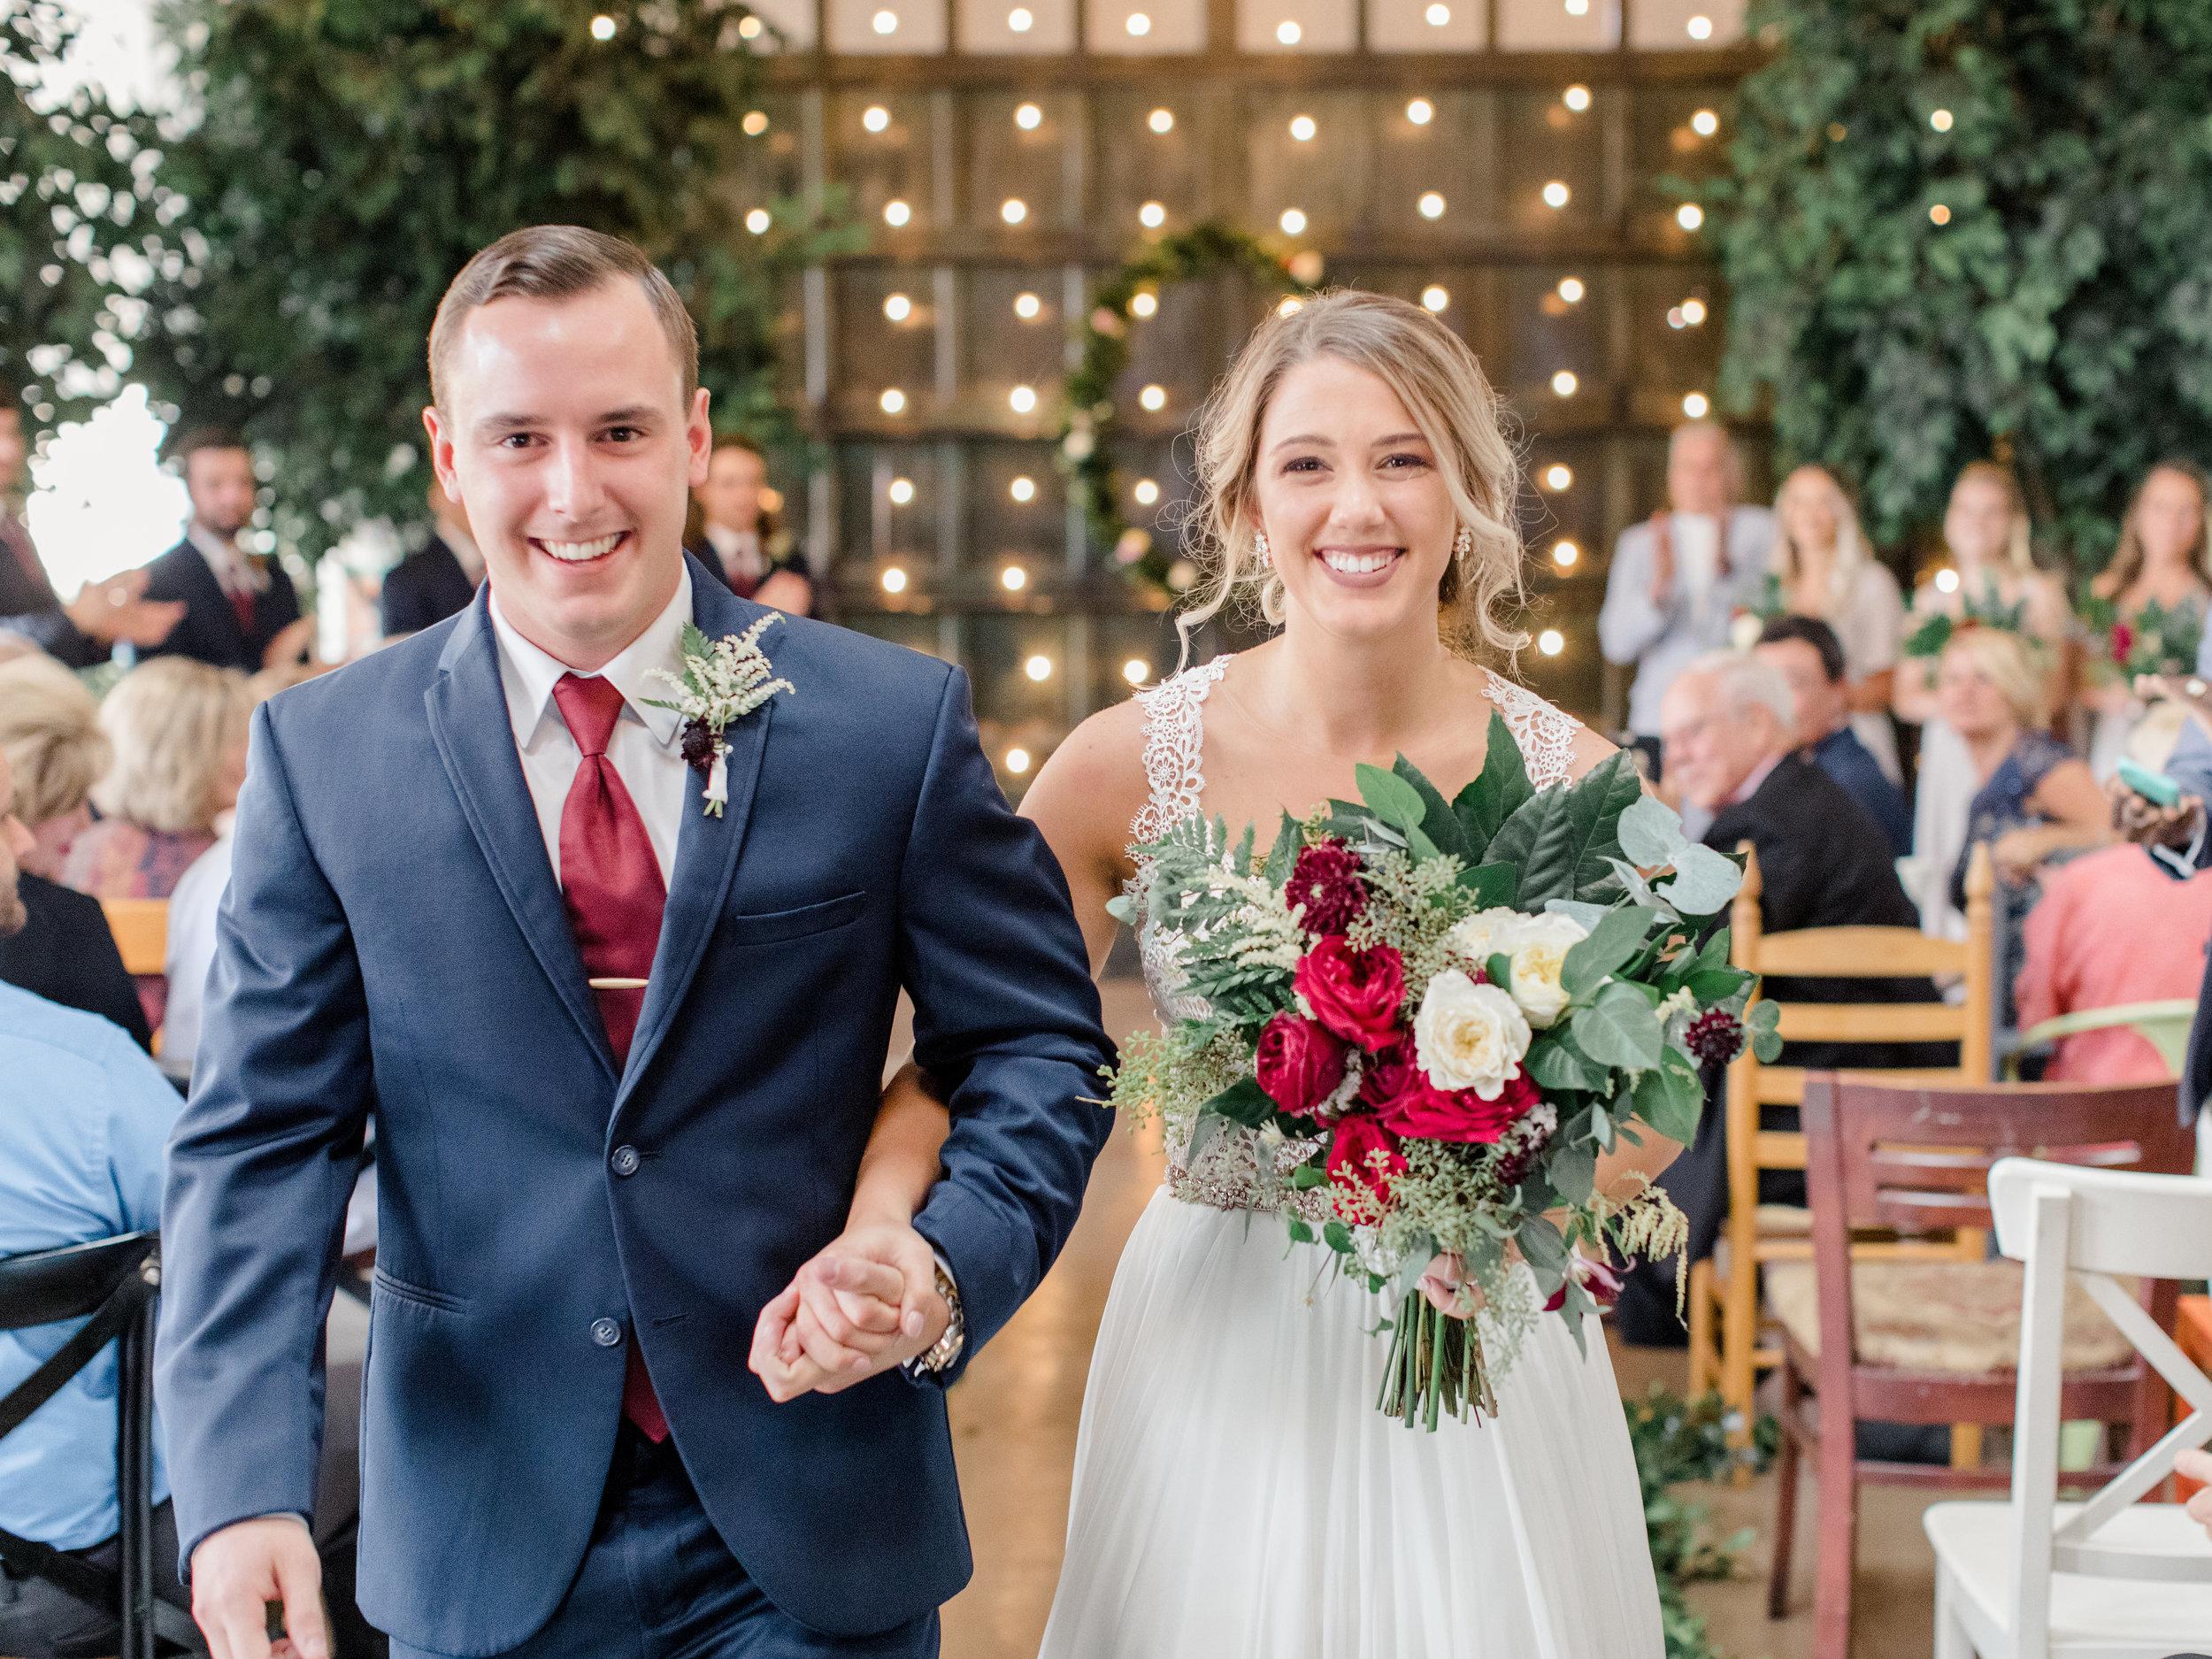 savannah-couple-savannah-bride-savannah-wedding-savannah-floral-savannah-florist-savannah-wedding-dress-wedding-gown-wedding-bouquet-red-wedding-ceremony-happy-couple